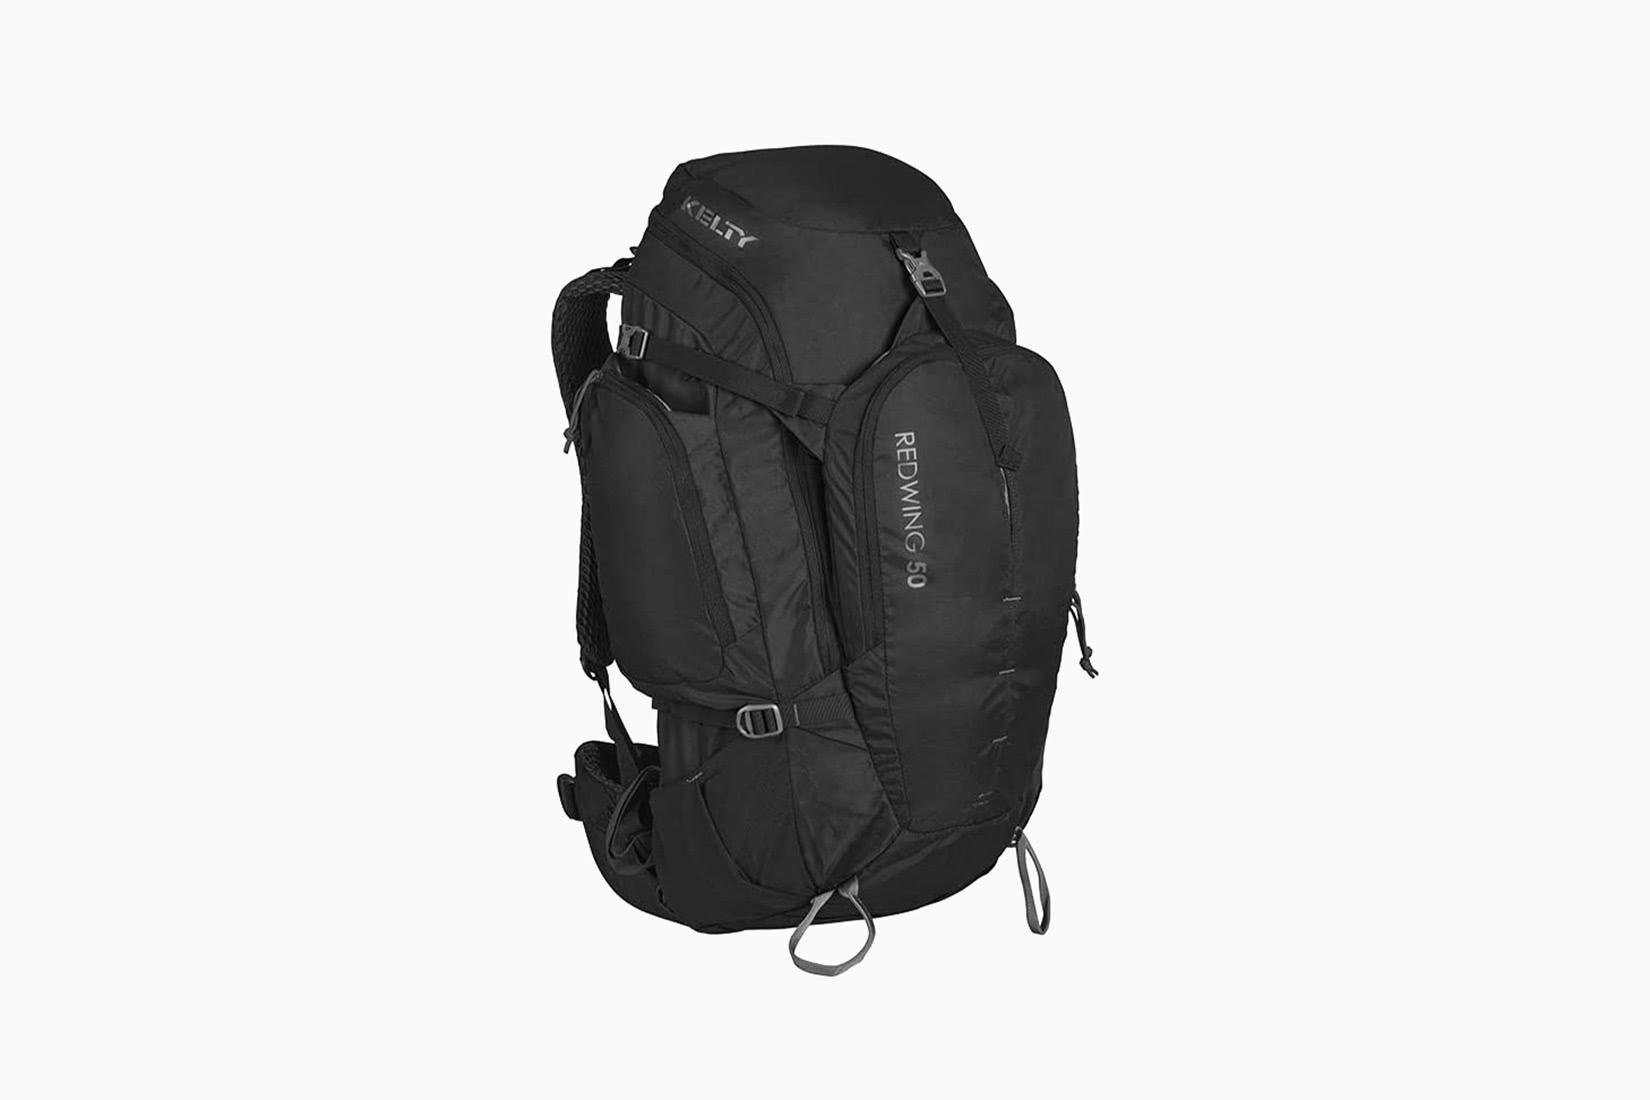 best travel backpack kelty redwing 50 - Luxe Digital